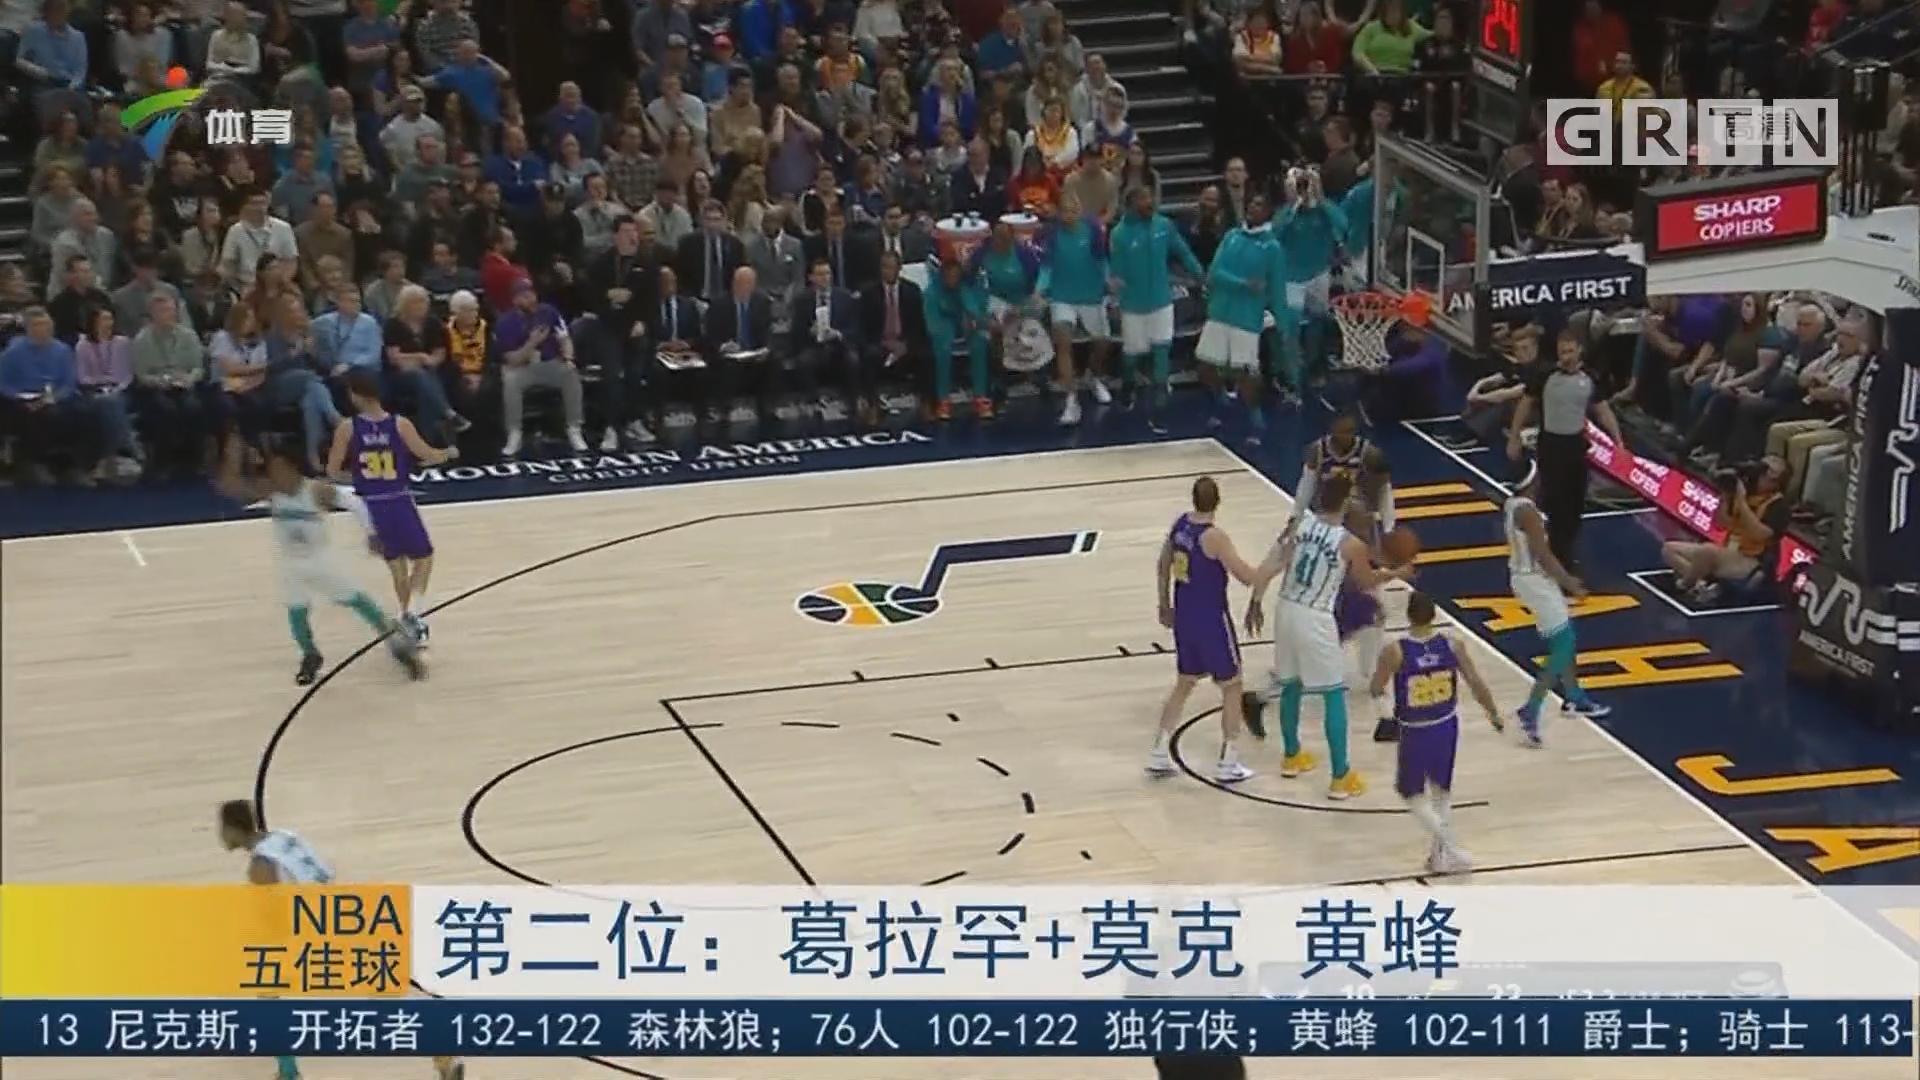 NBA 五佳球